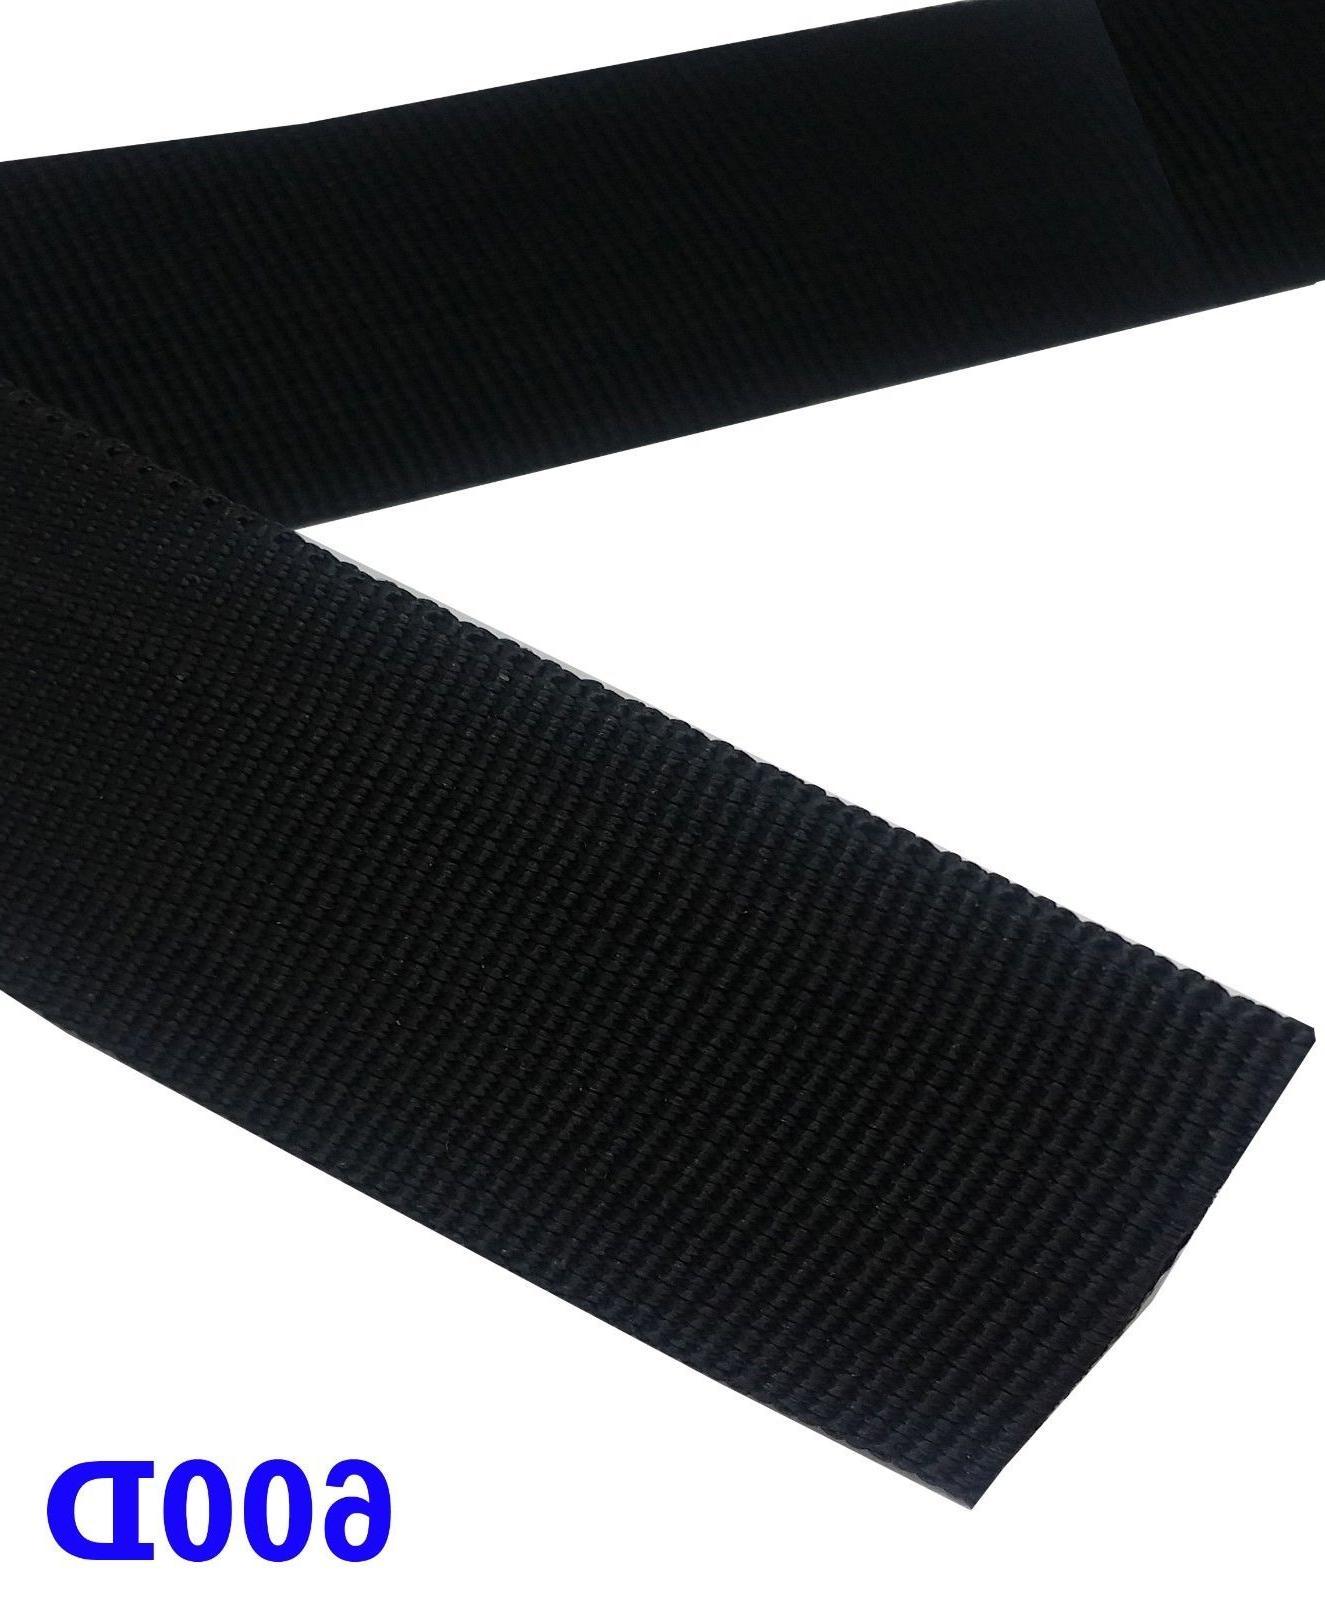 Heavy Inch 600D Black Strap 5/10